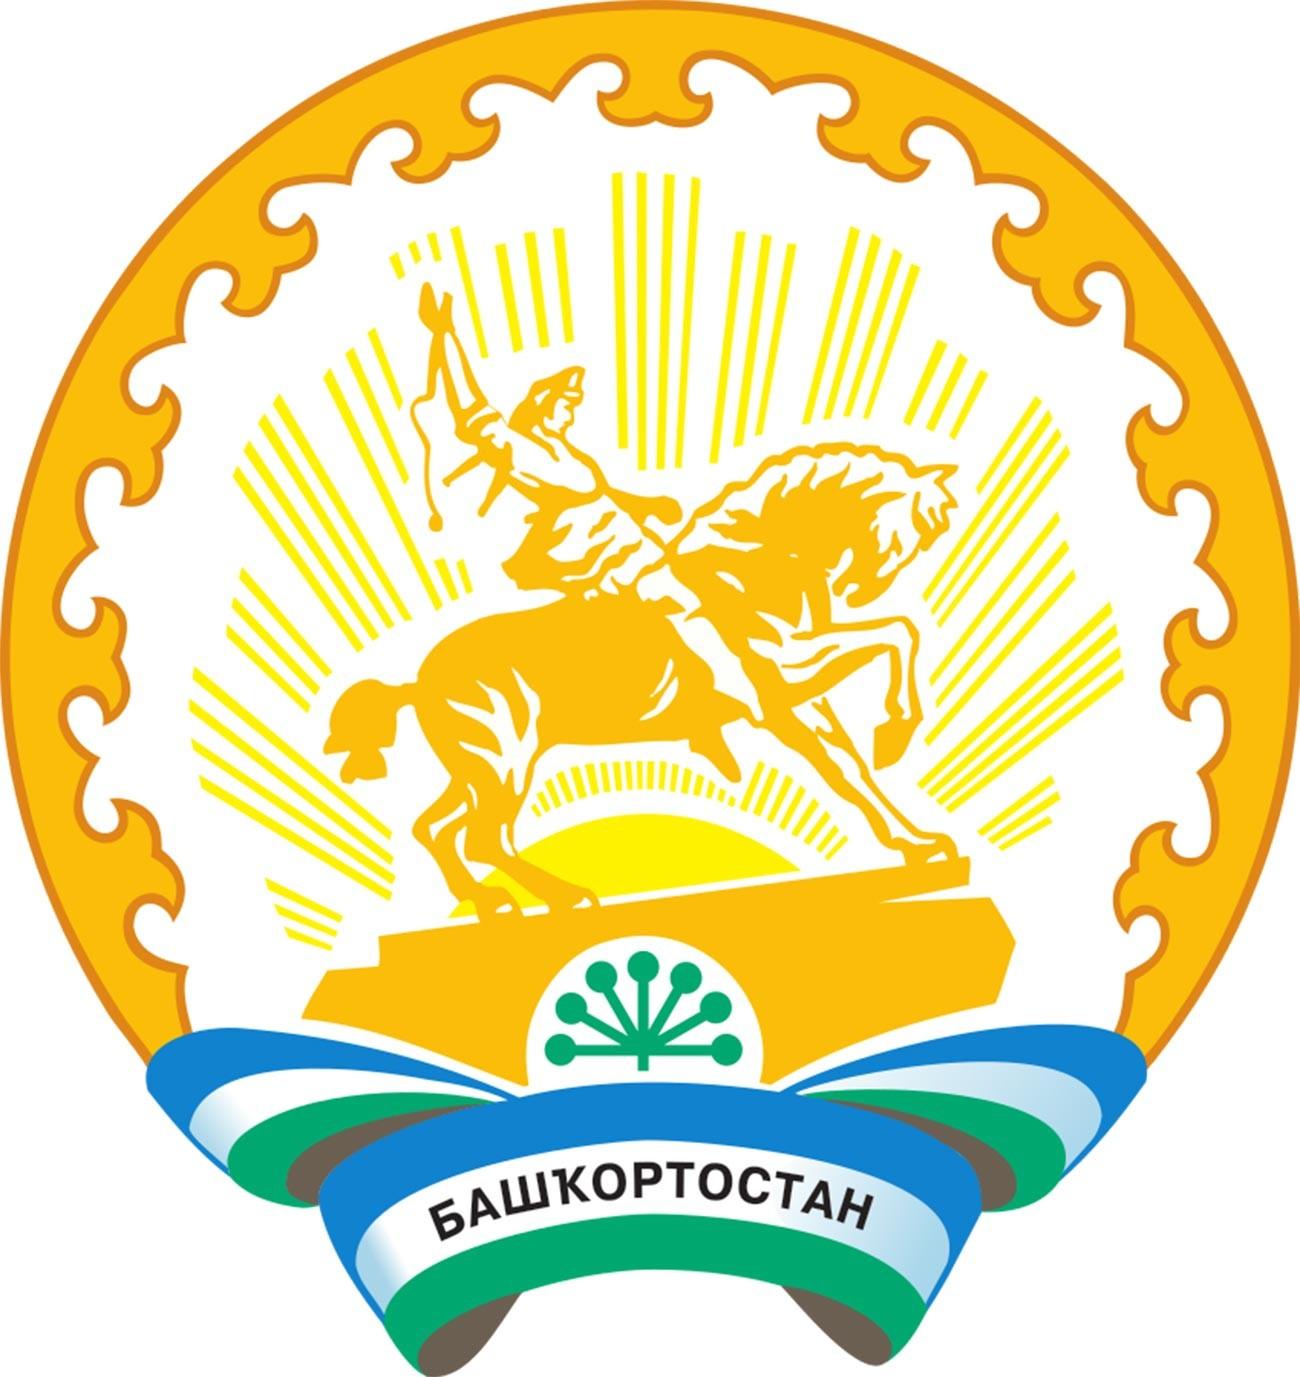 L'emblema ufficiale della Repubblica del Bashkortostan (Baschiria)